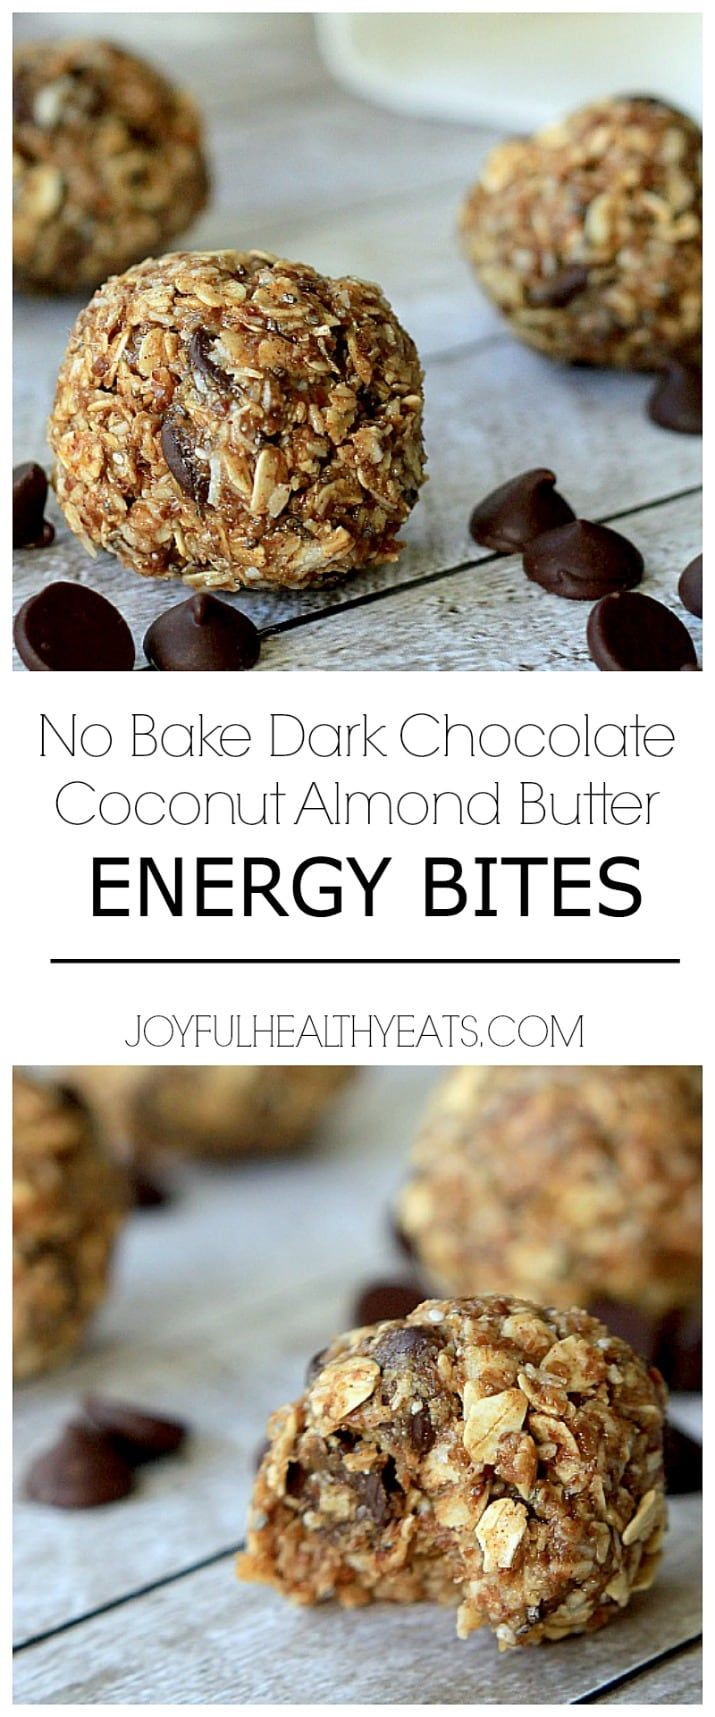 No Bake Dark Chocolate Coconut Energy Bites | Easy & Healthy Snack